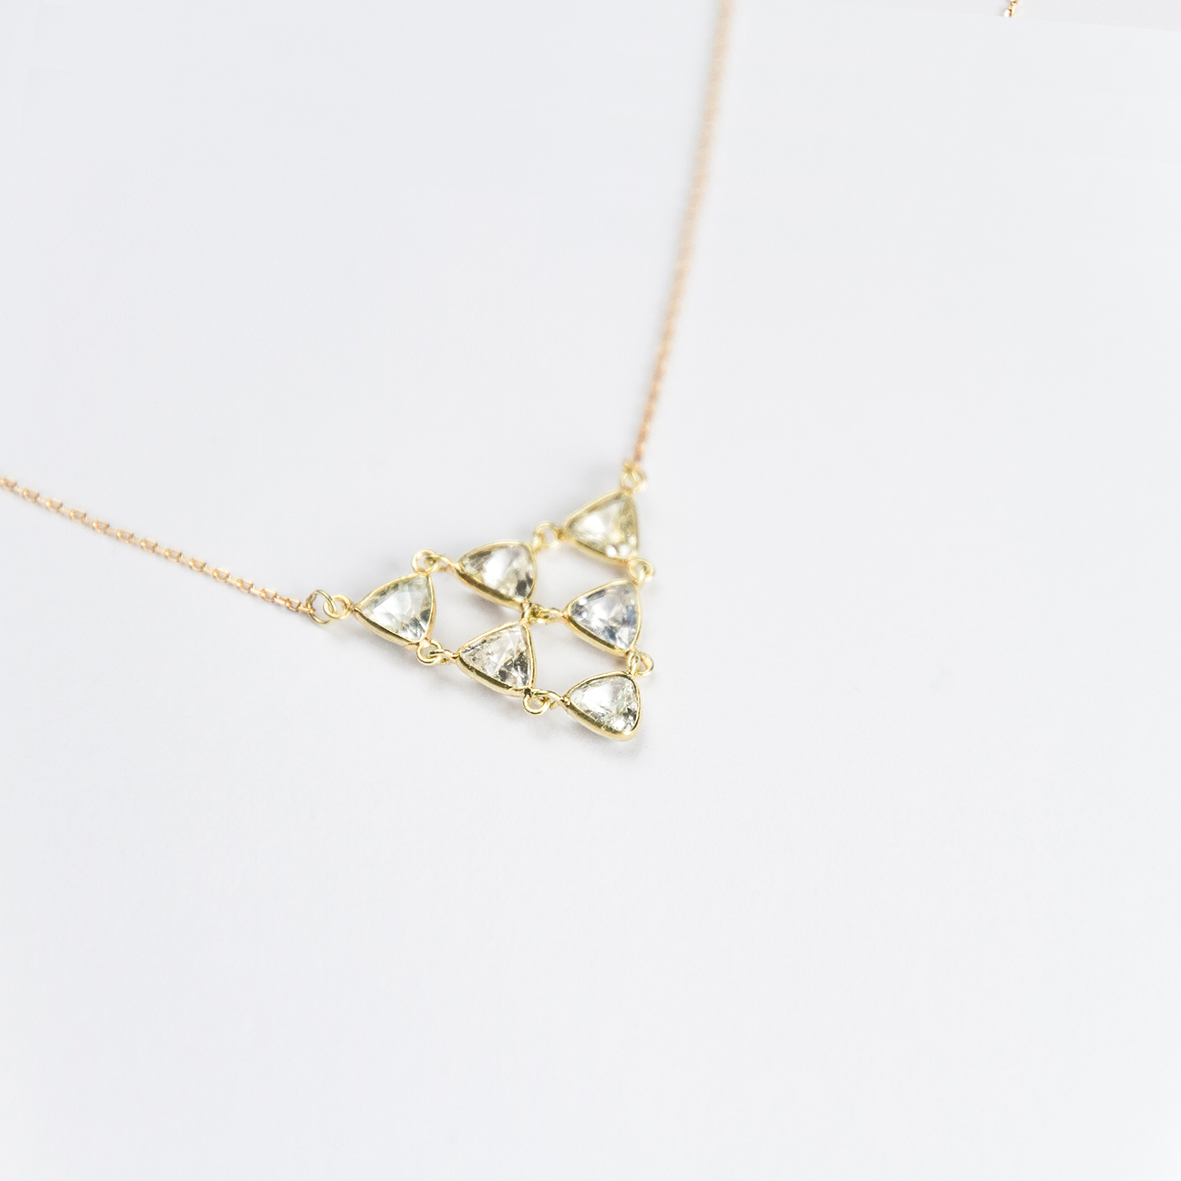 1. OONA_philo_ficha2_sapphire triangles cascade necklace